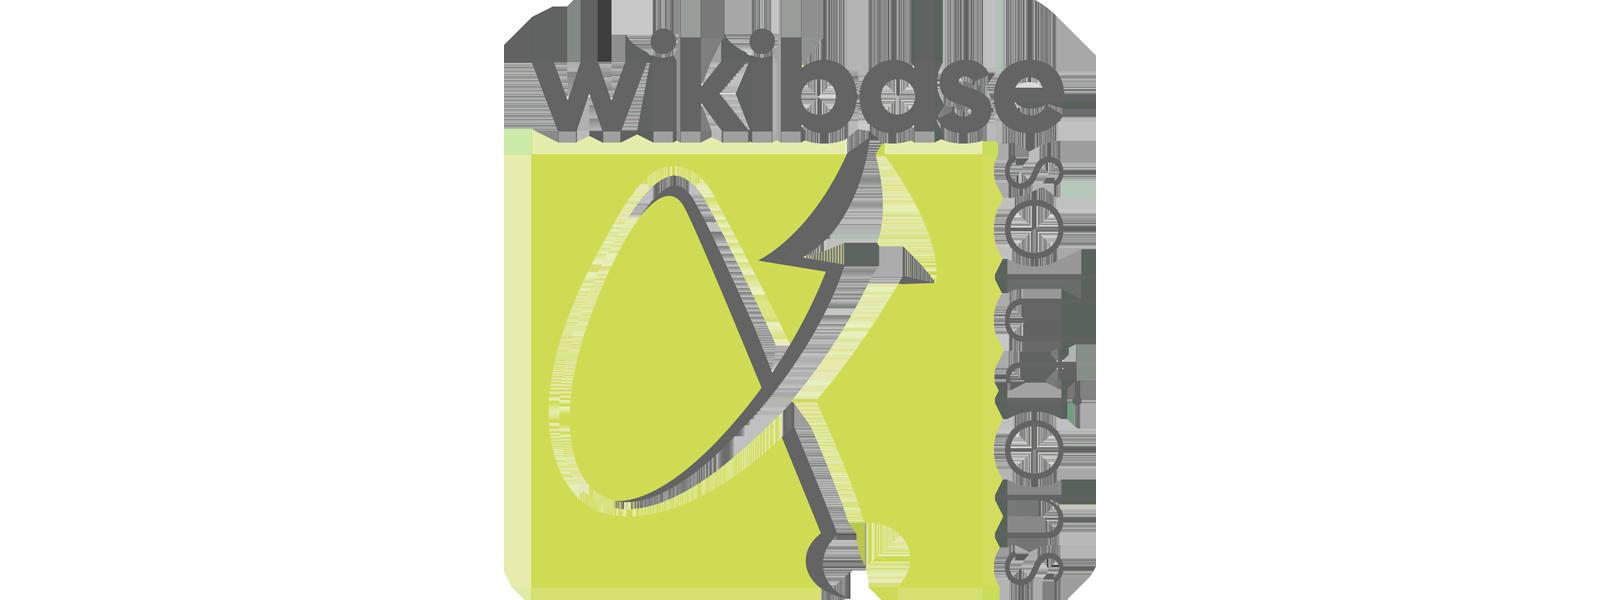 Wikibase Solutions partner logo